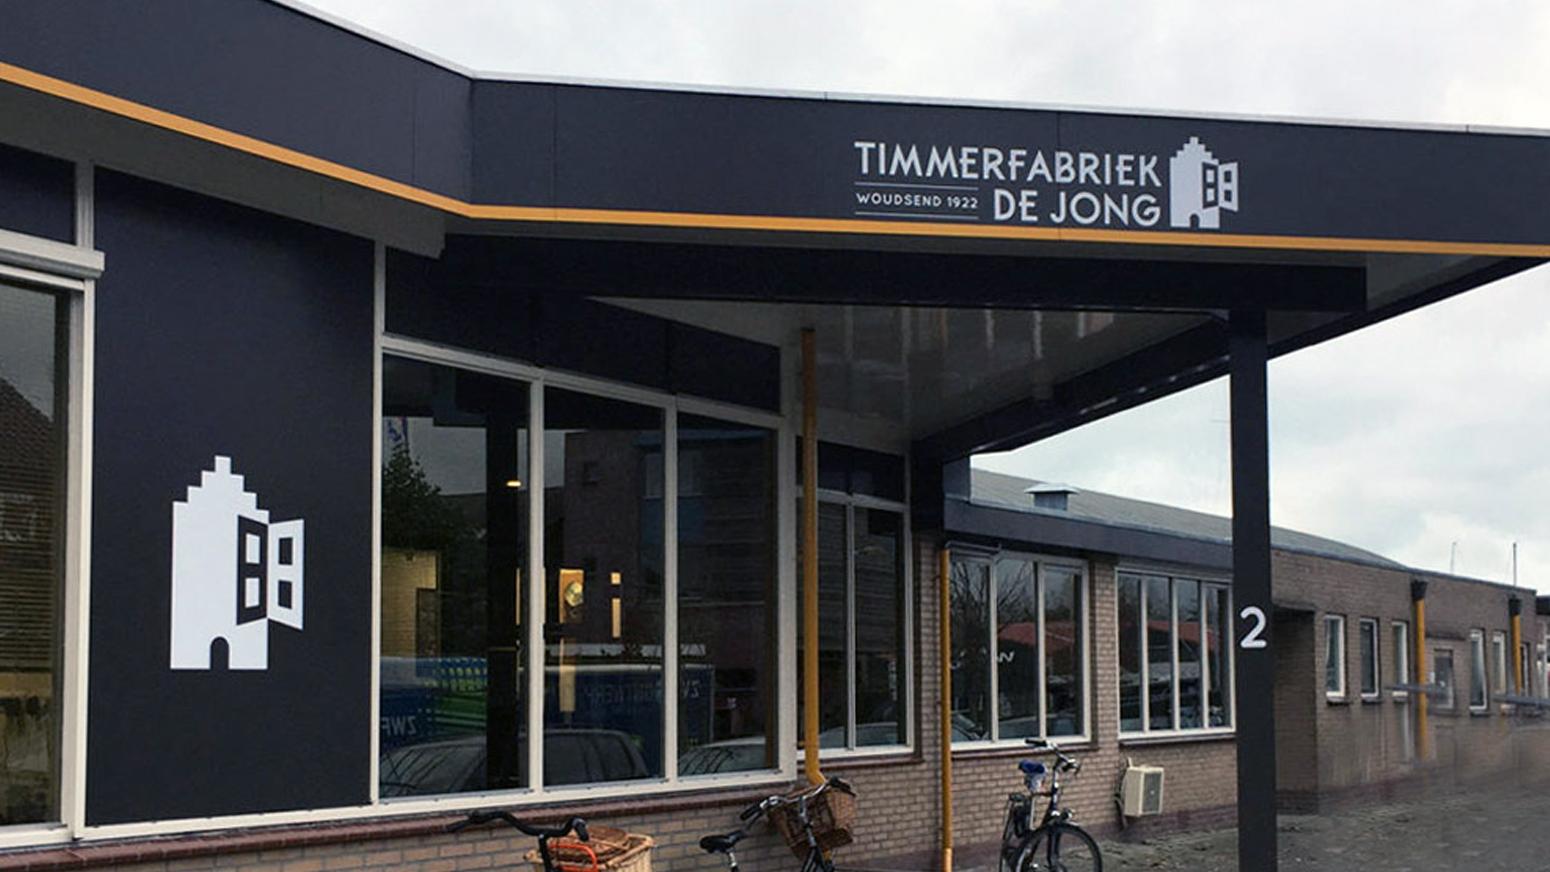 Gebouw Van Timmerfabriek De Jong Woudsend BV